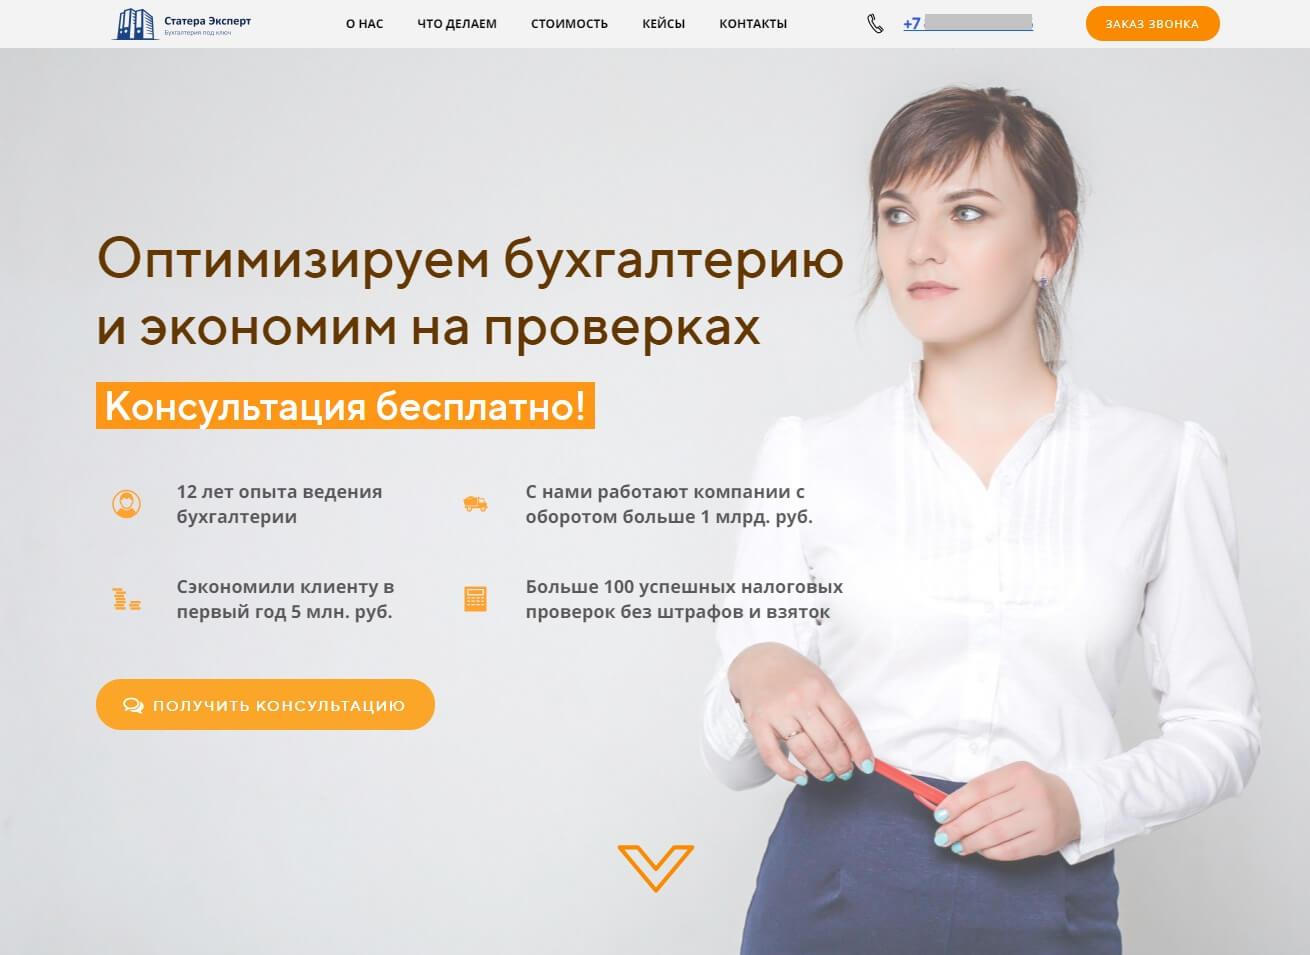 Лендинг для Яндекс Директ